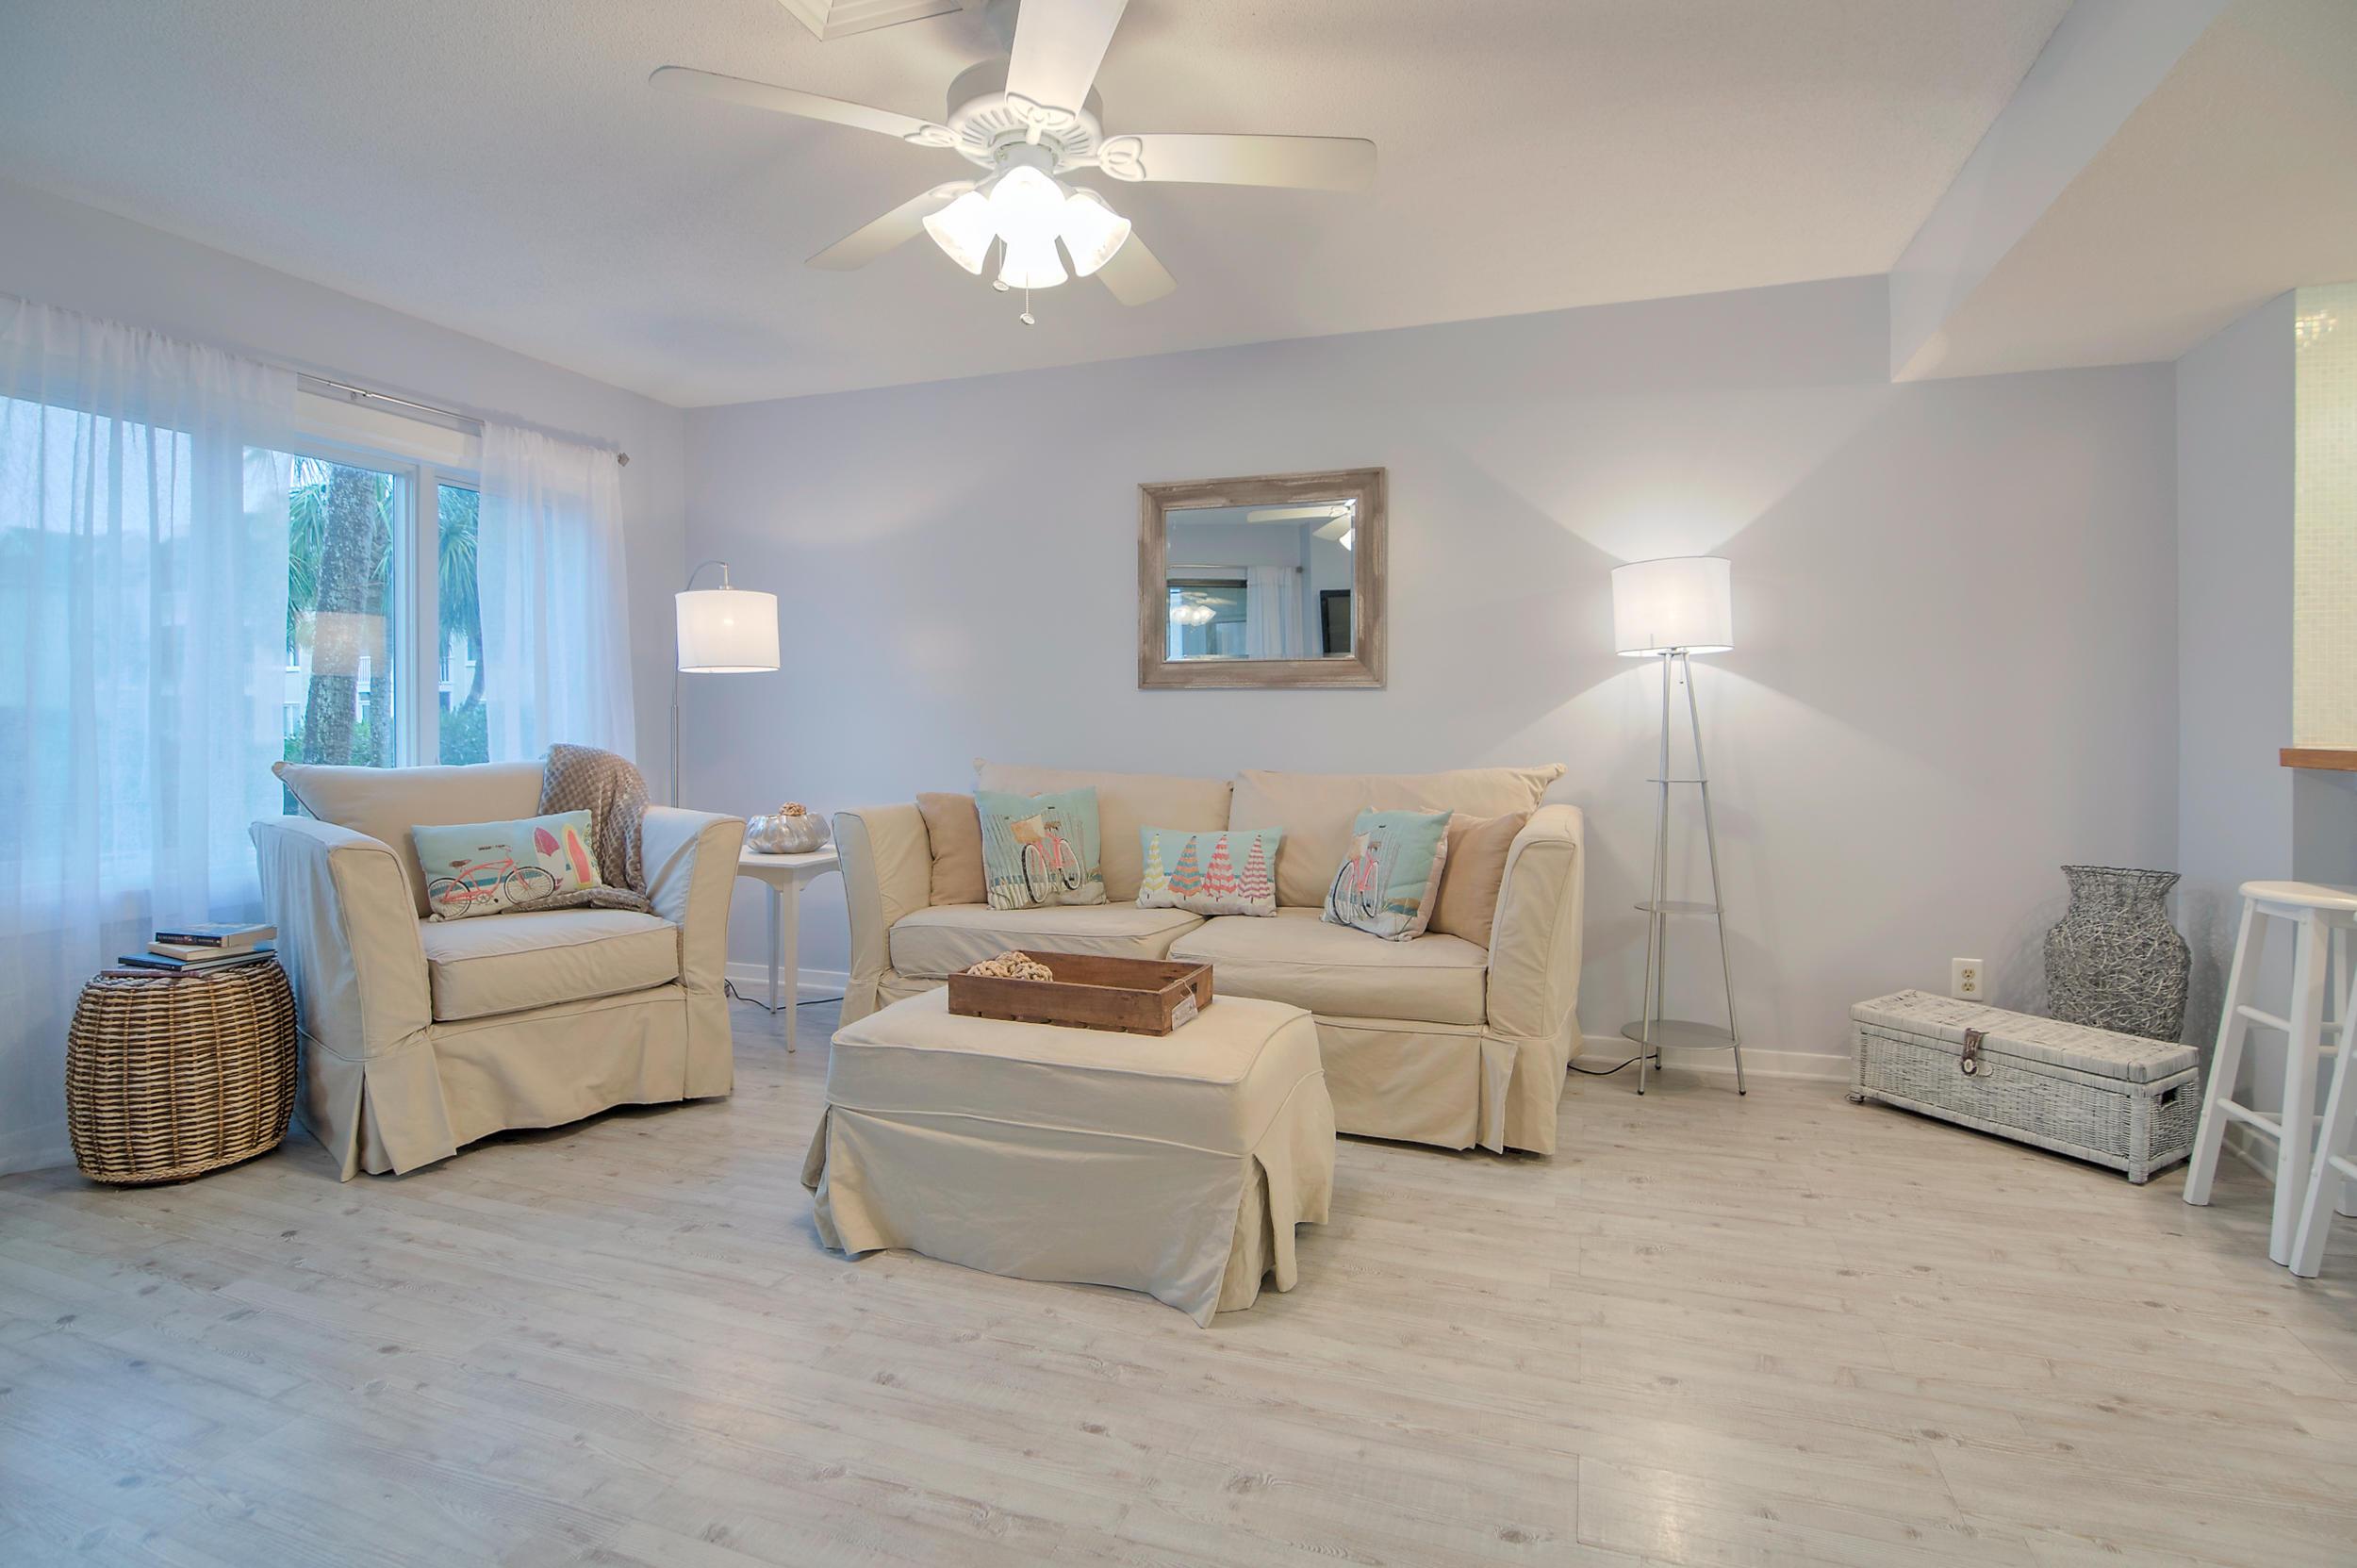 Port Ocall Homes For Sale - 103 Port O Call, Isle of Palms, SC - 9